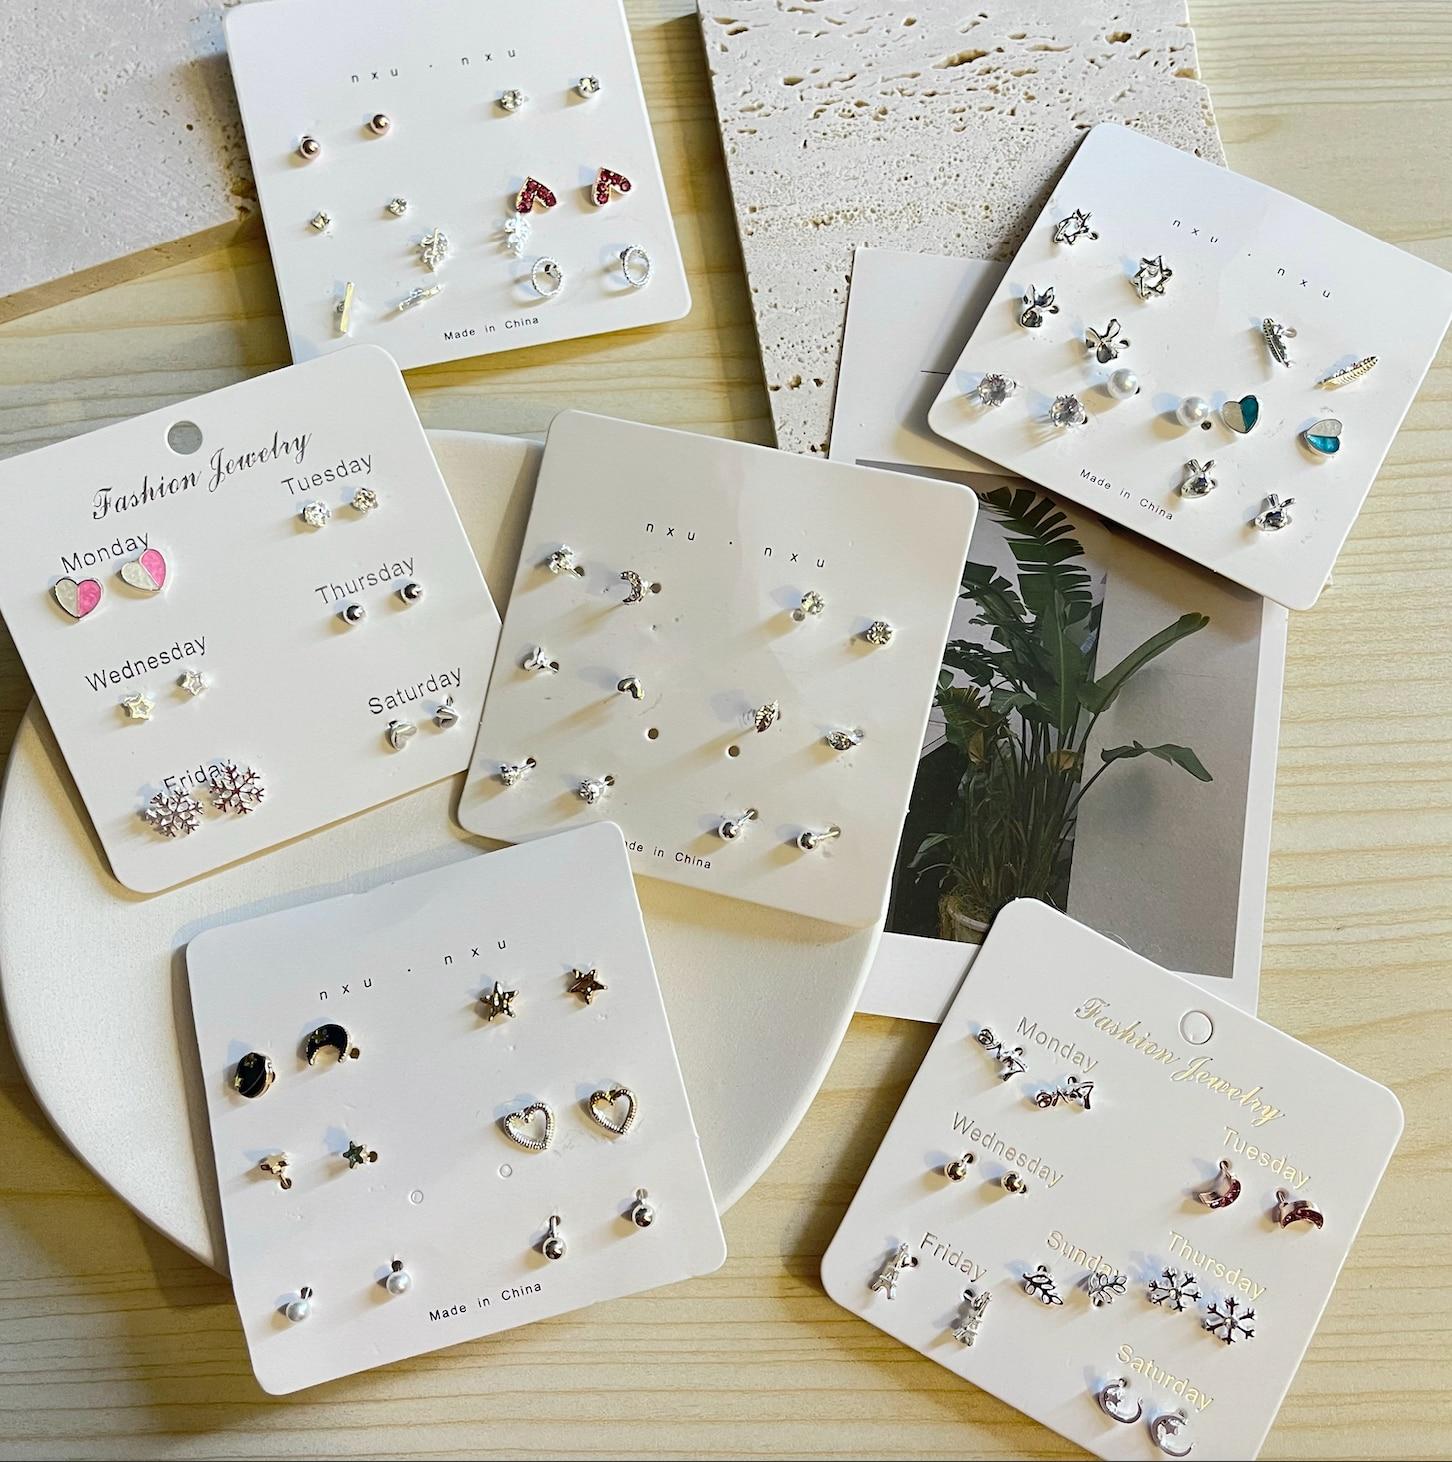 7Rings Trendy Style Week Cute Studs Earrings Set for Women Girl 7 PCs Set Jewelry Set Accessories Gi